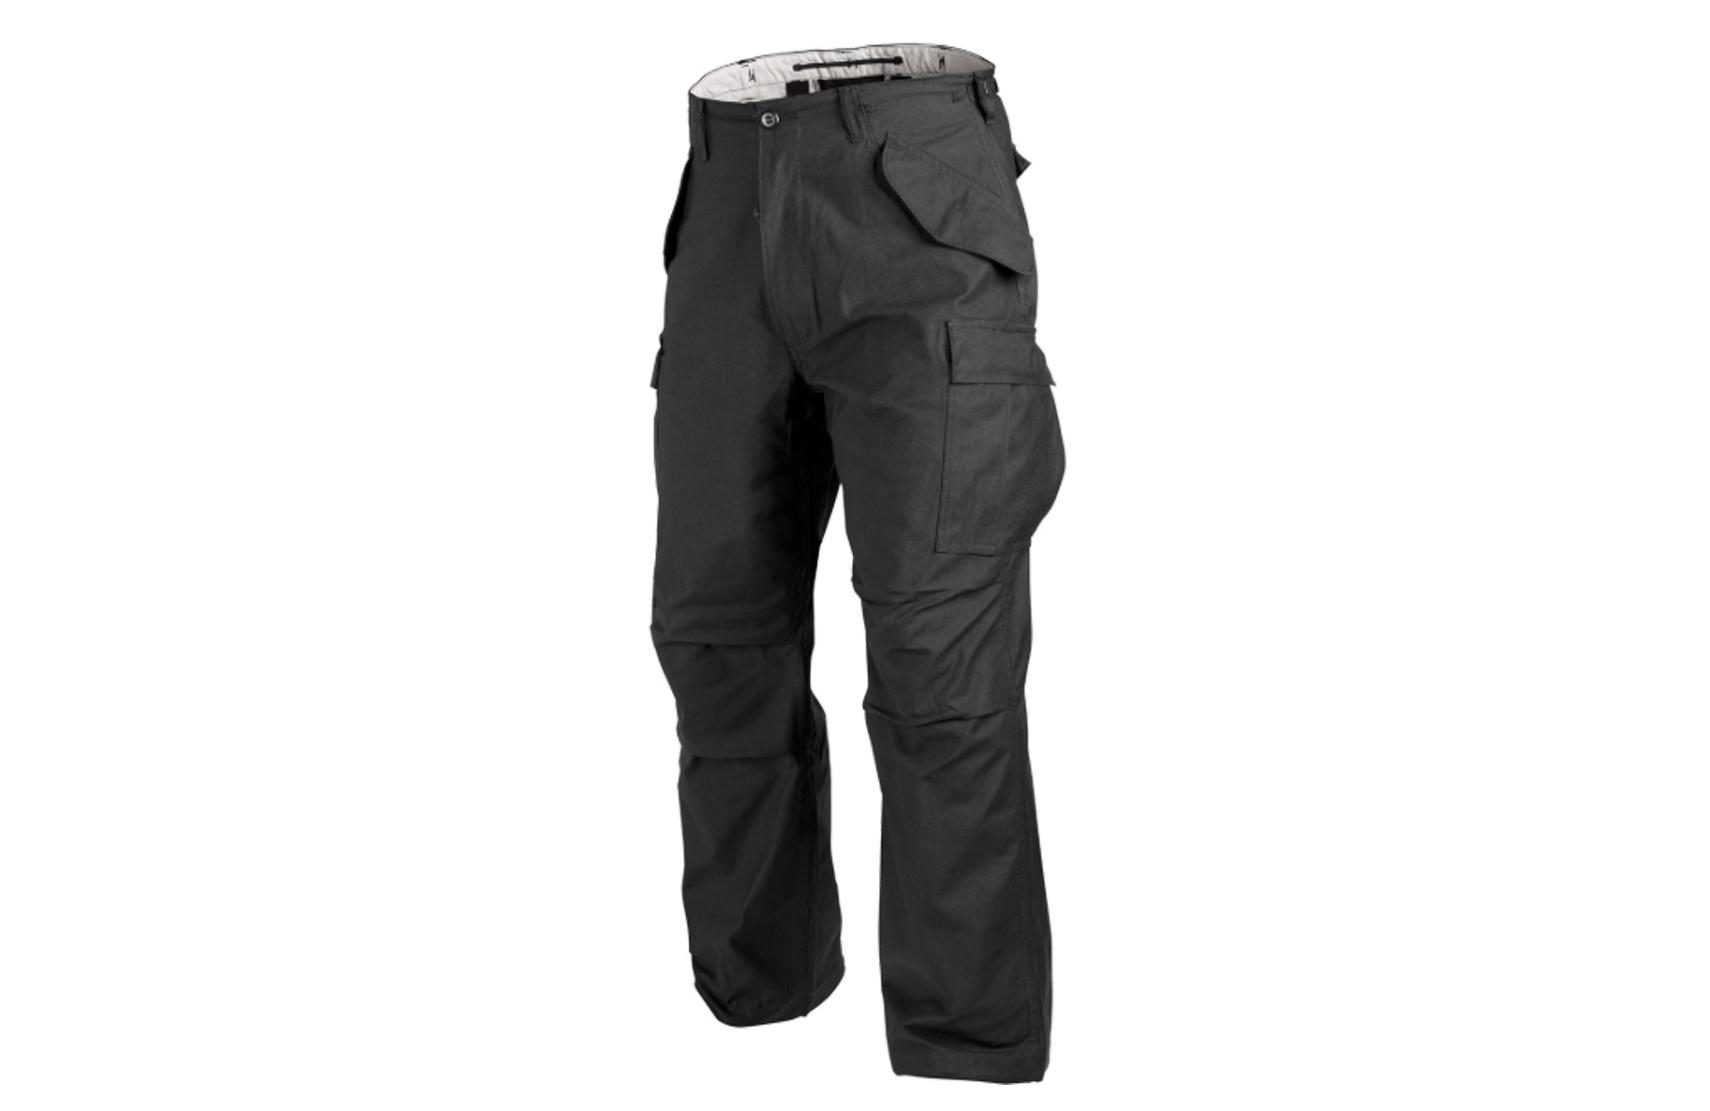 Spodnie Helikon M65 - Nyco Sateen - Czarne L/Regular